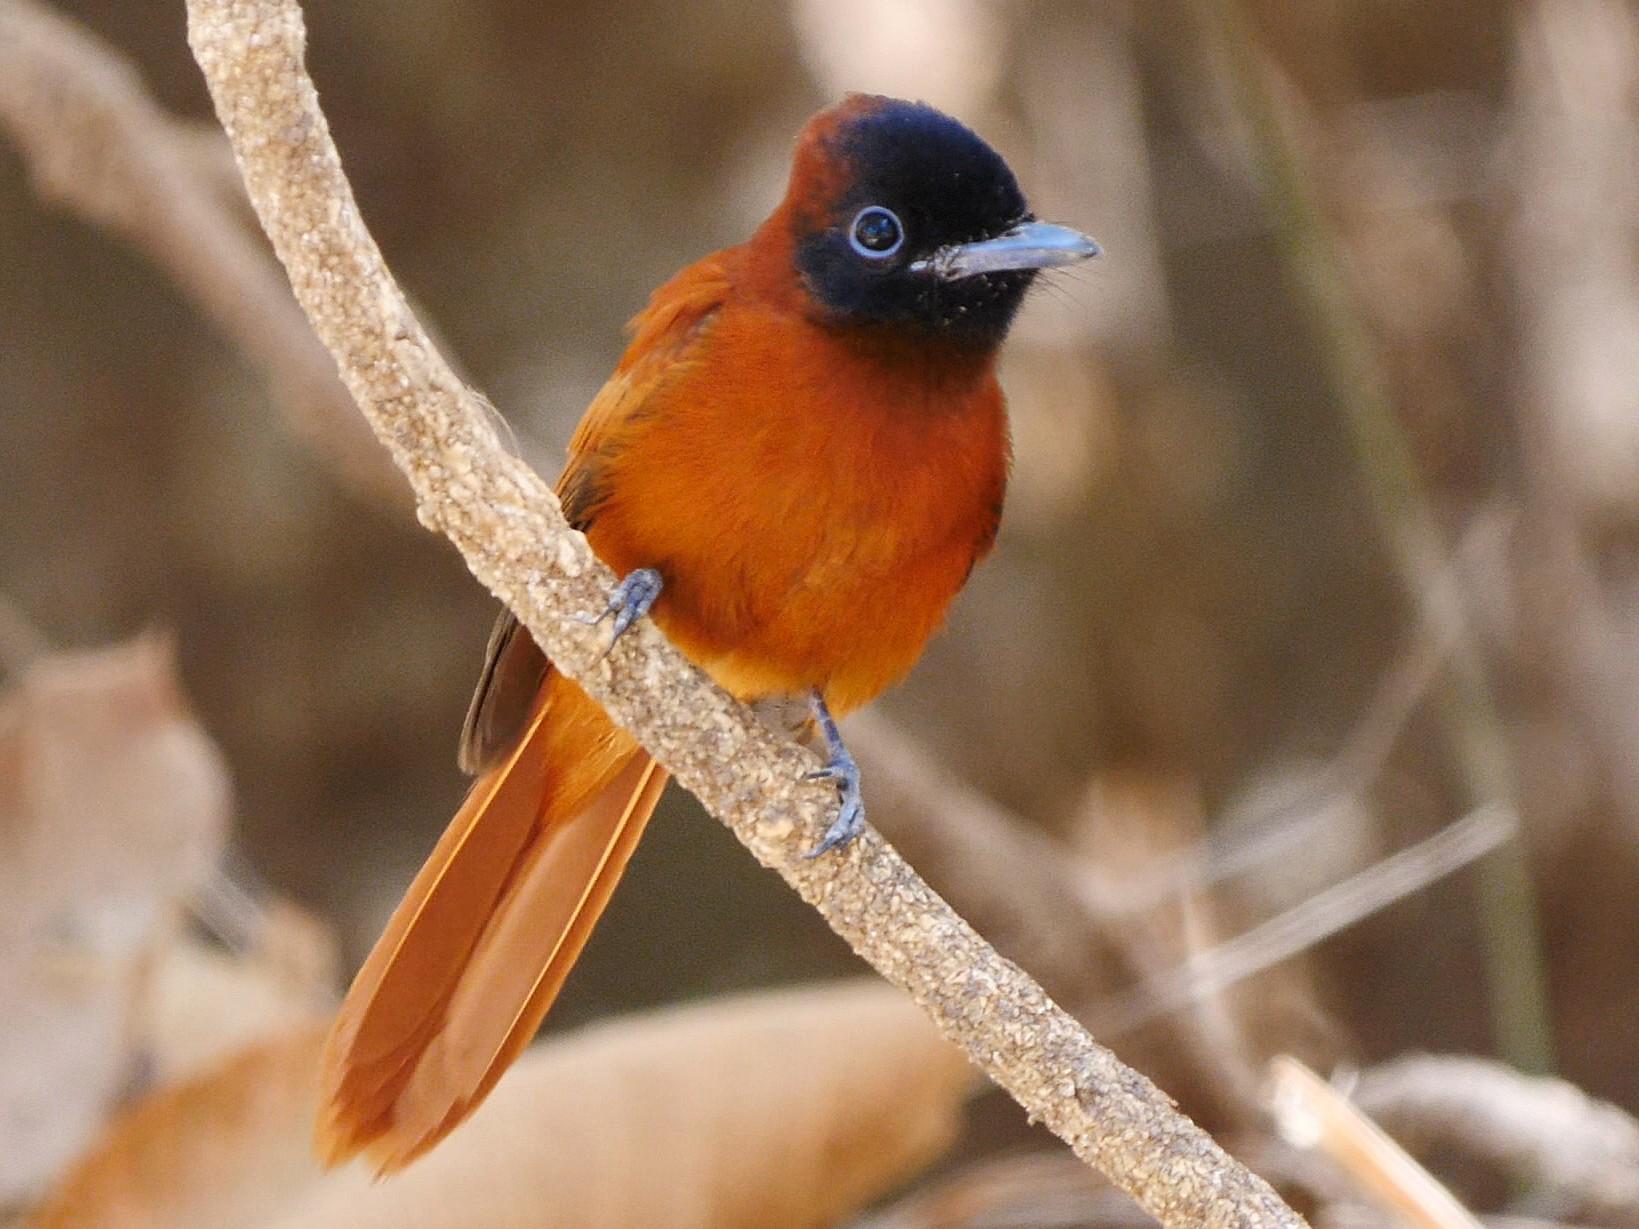 Black-headed Paradise-Flycatcher - Josep del Hoyo